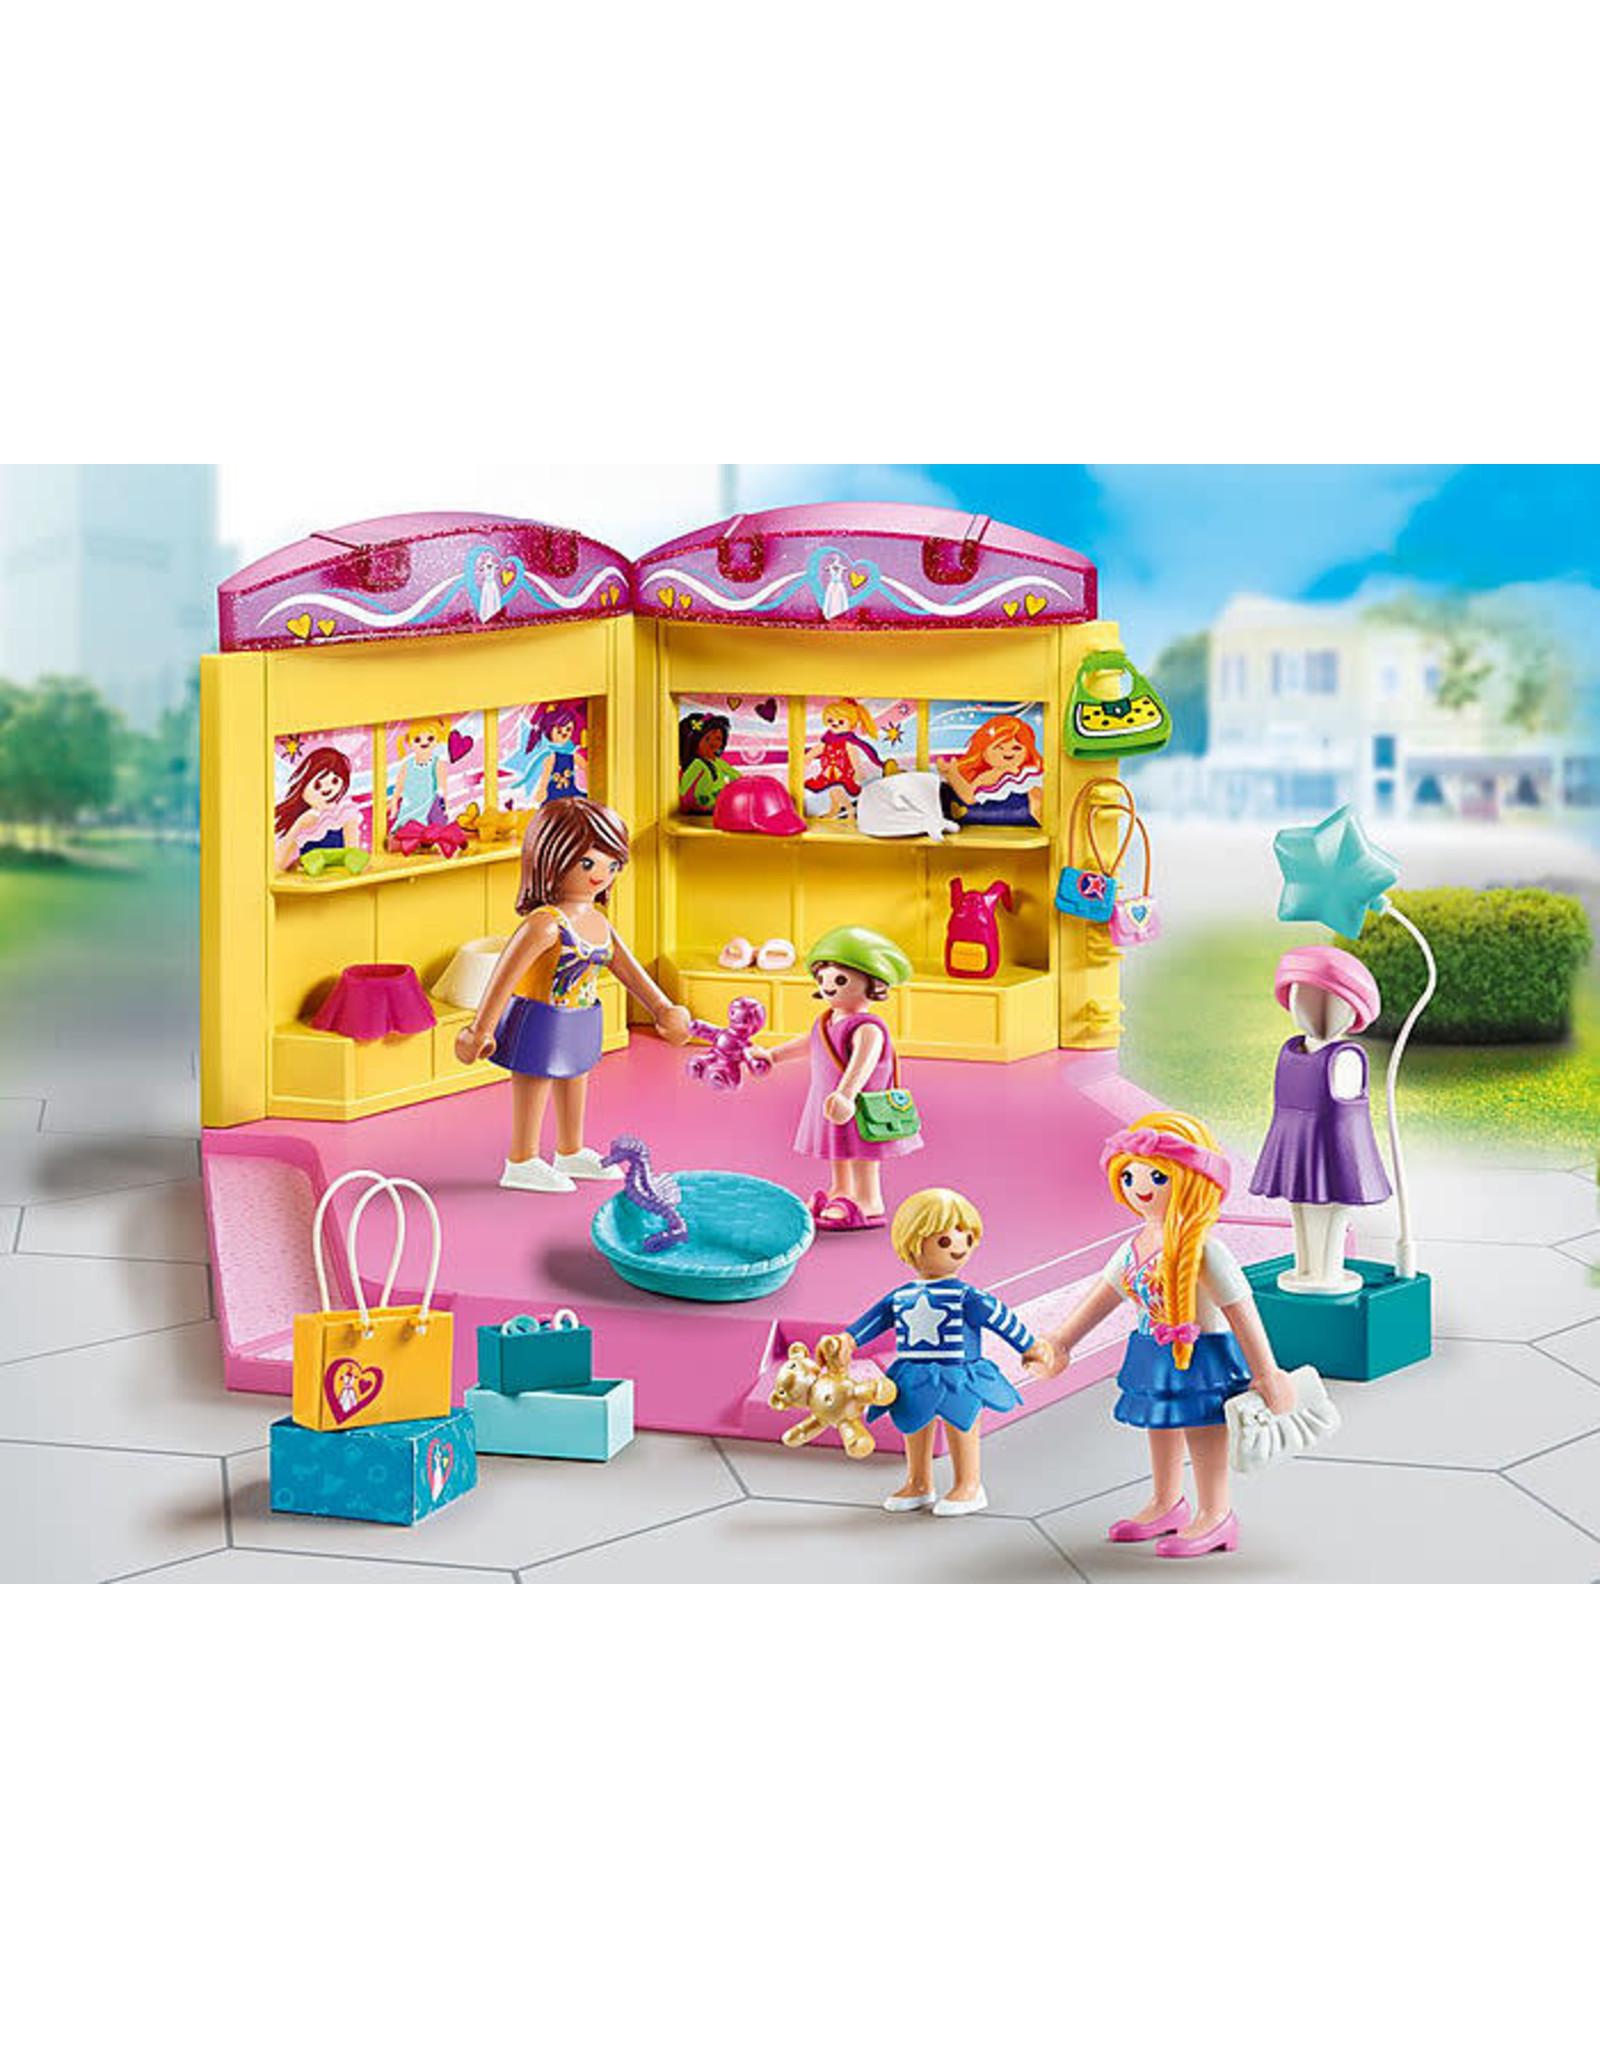 Playmobil Children's Fashion Store